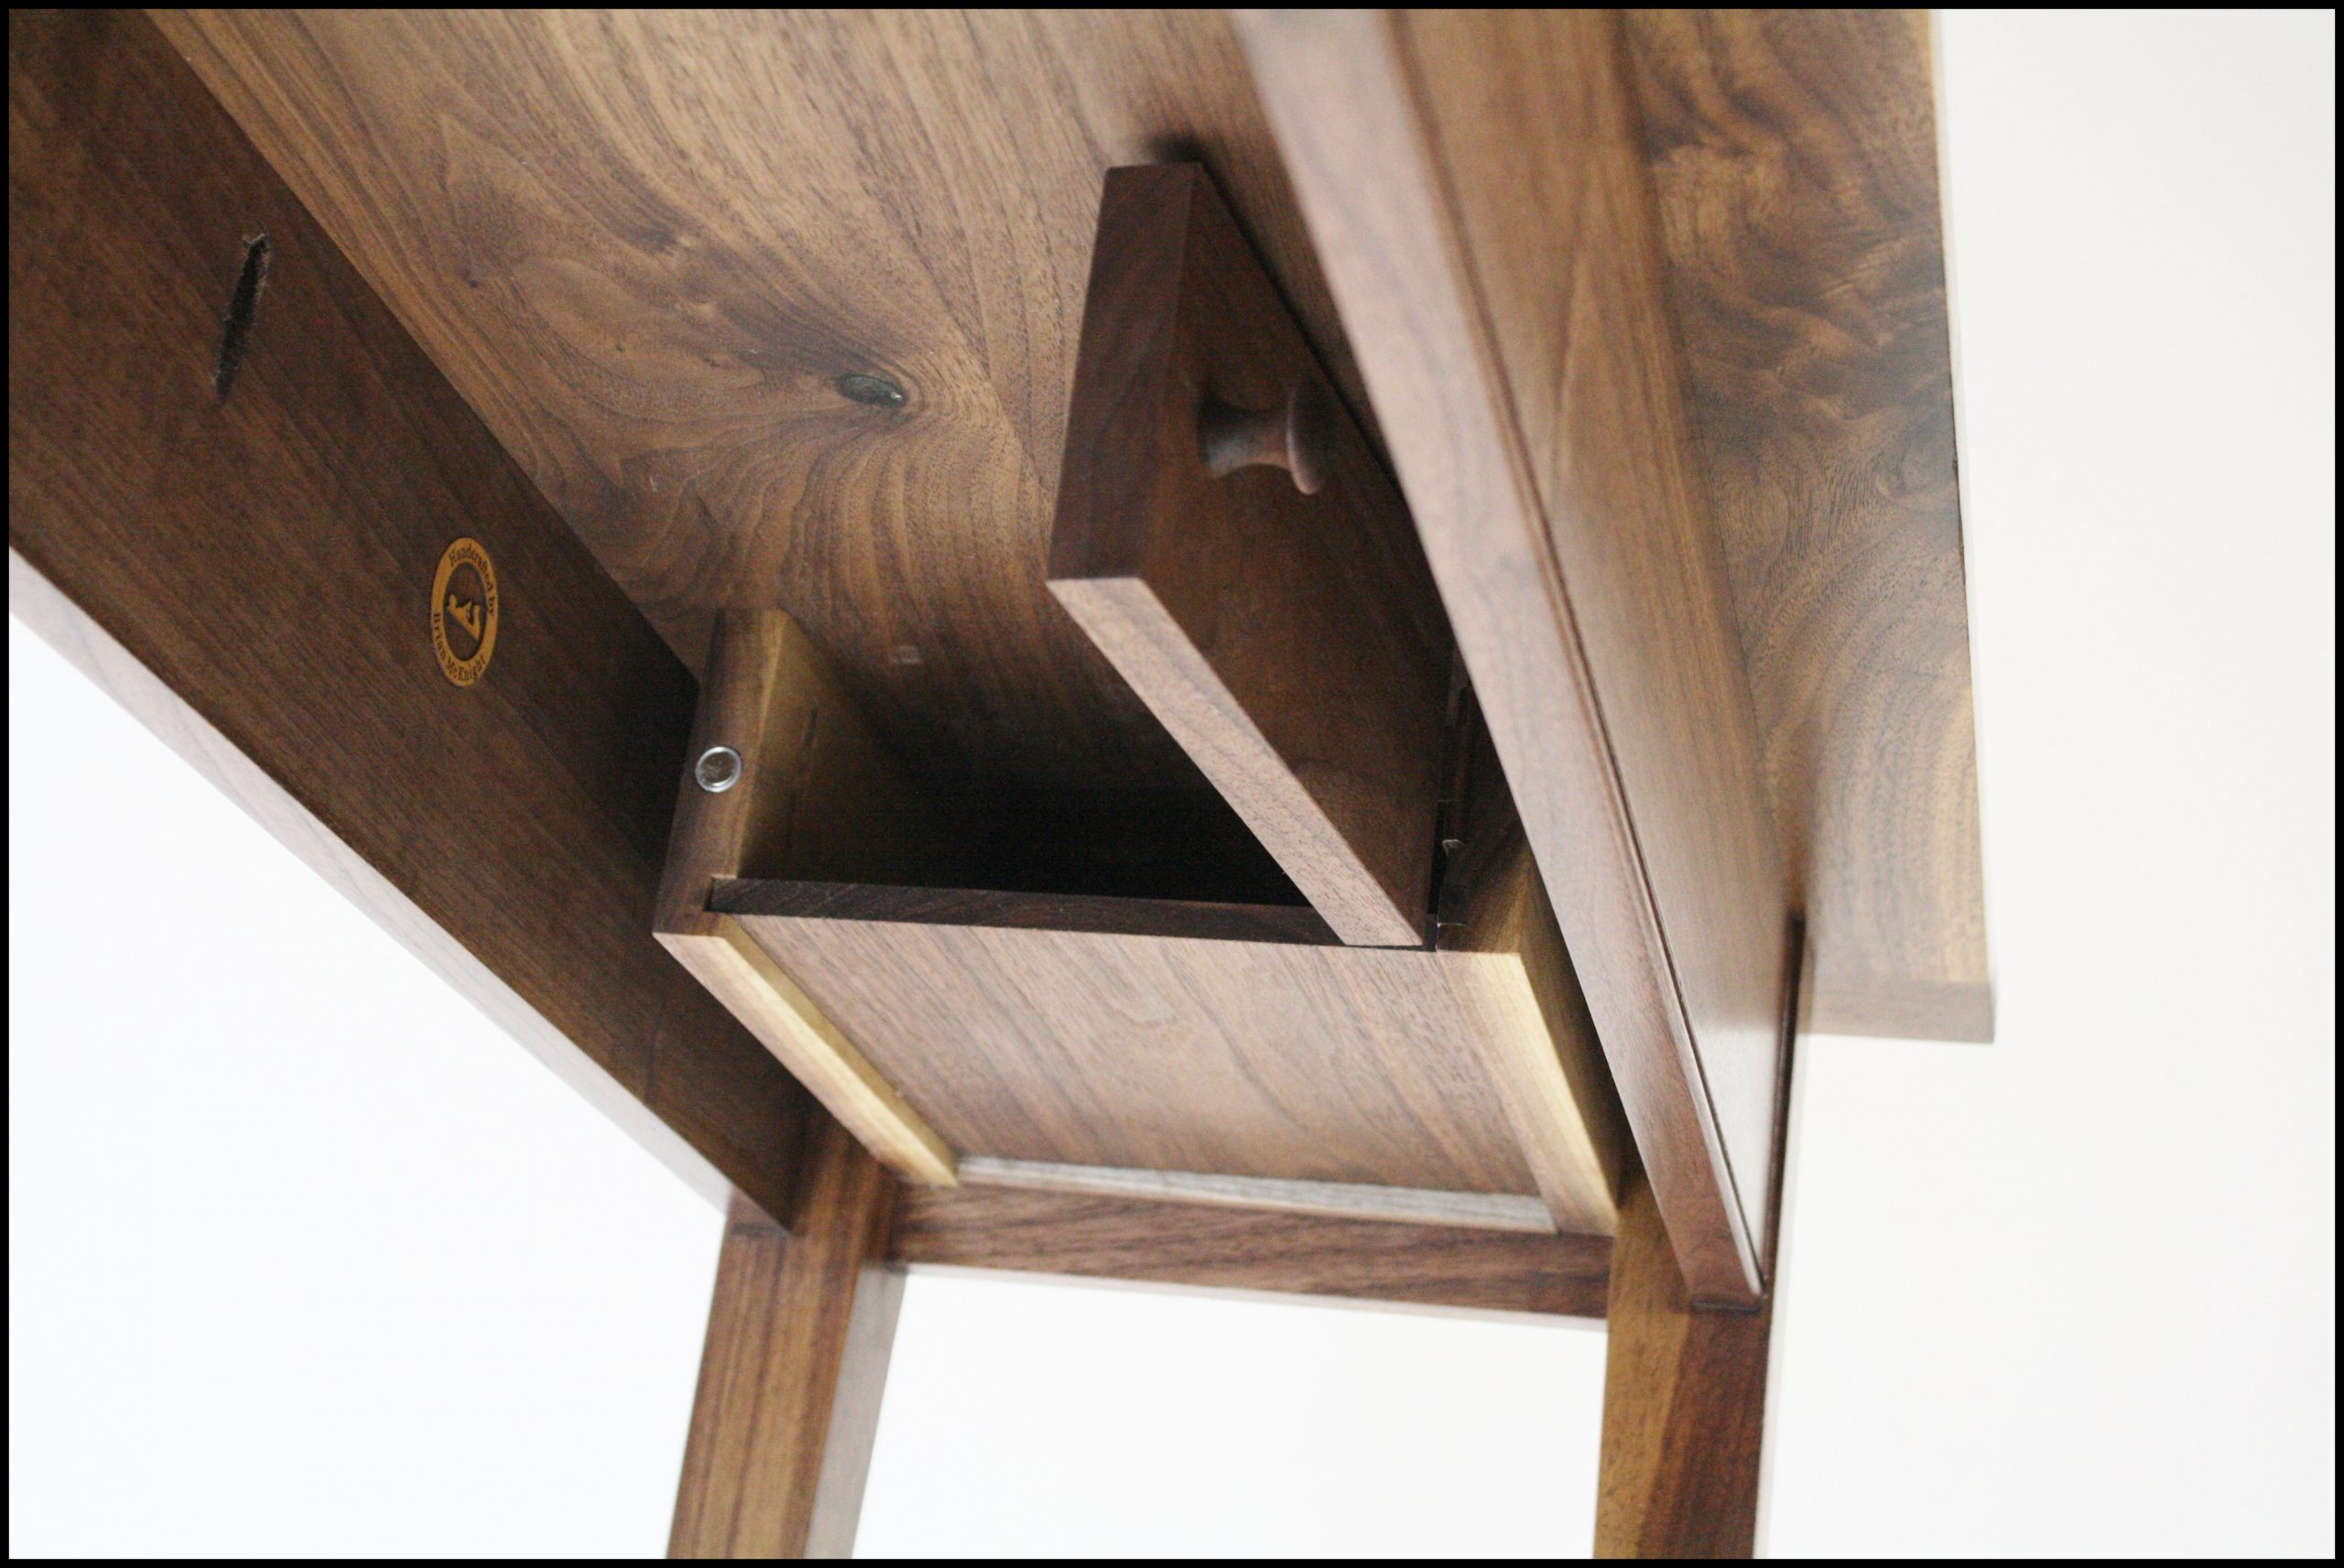 Hidden stash box under console table